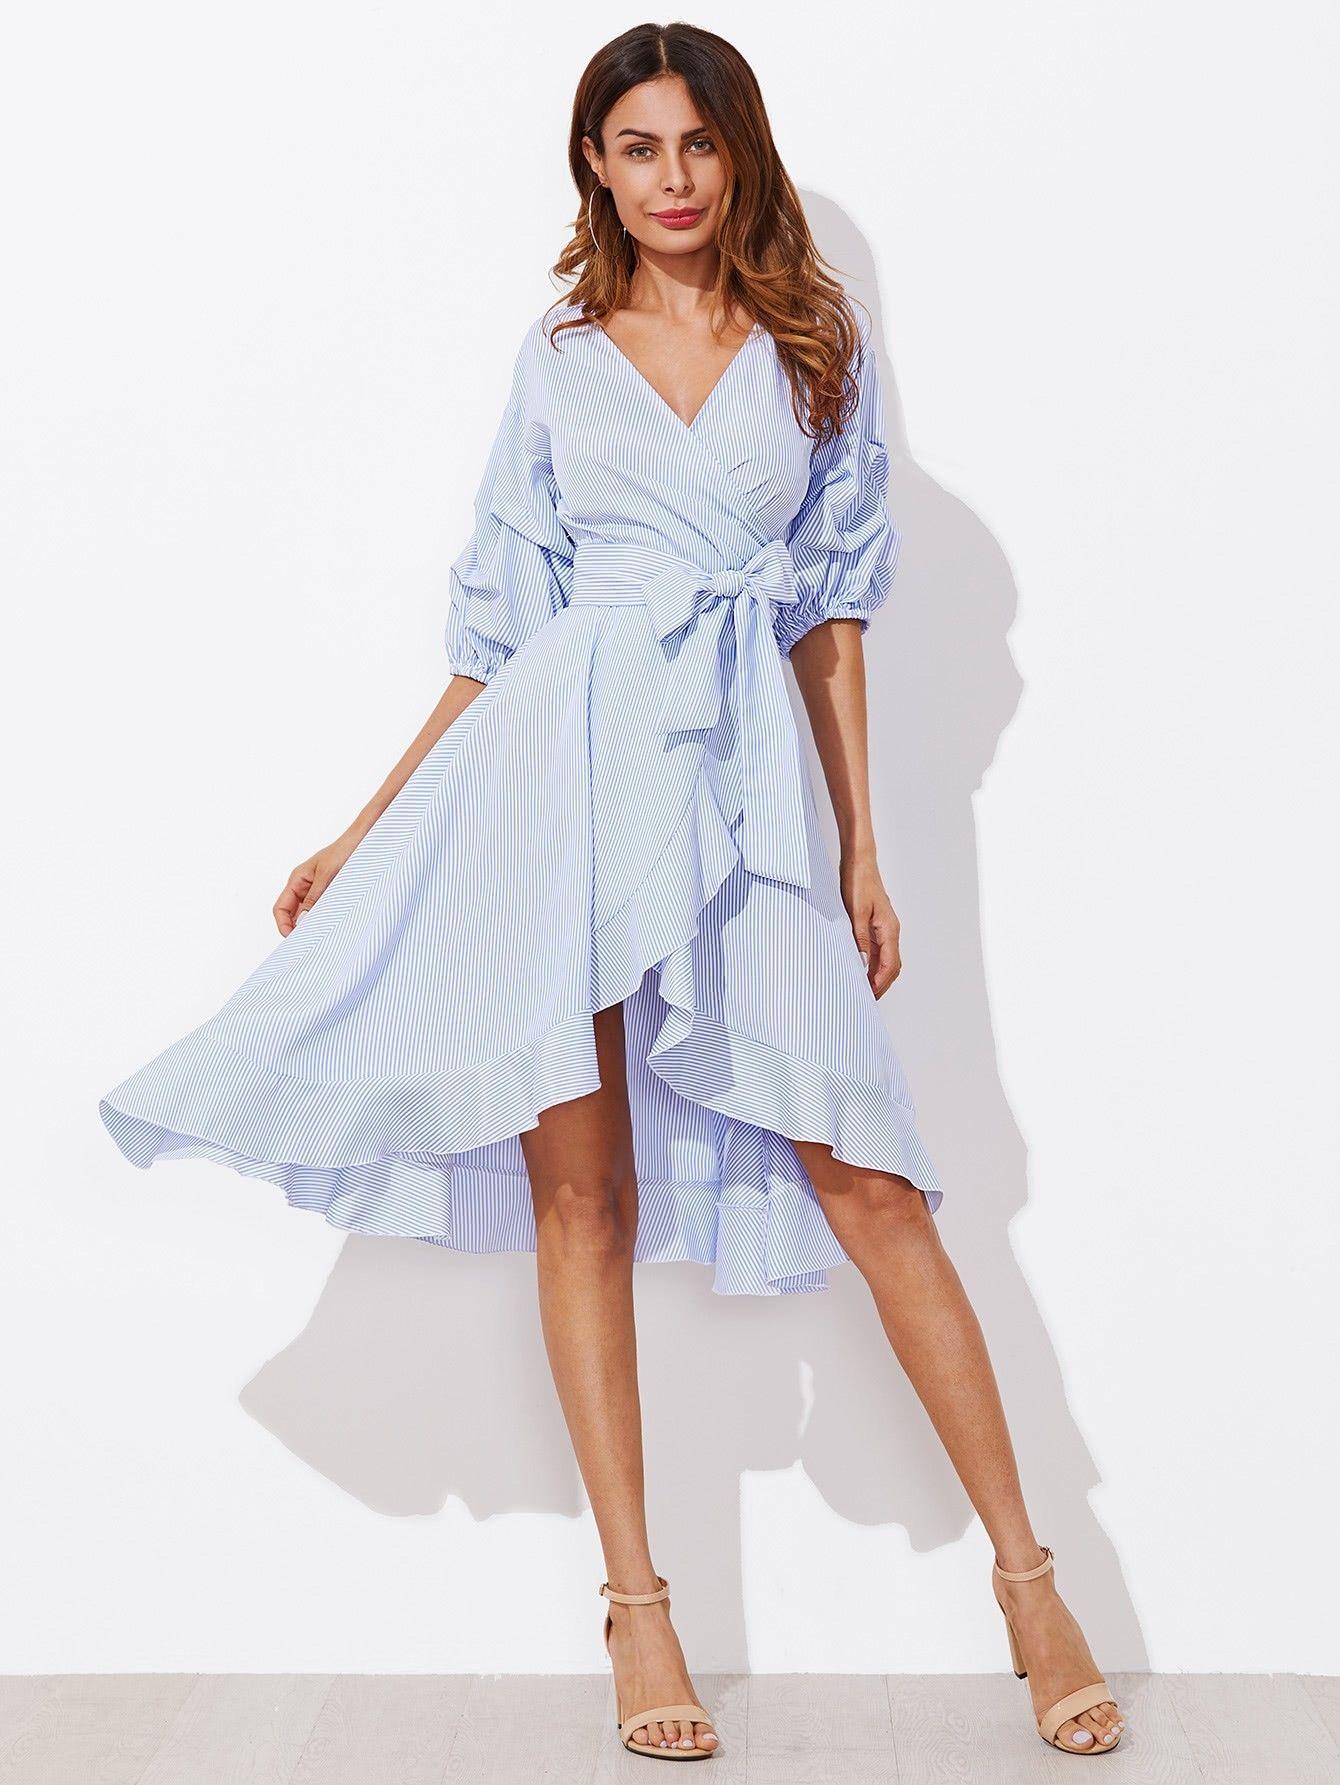 Pin By Maabena Badwe On Nab In 2020 Pinstripe Dress Ruffle Hem Dress Wrap Dress [ 1785 x 1340 Pixel ]